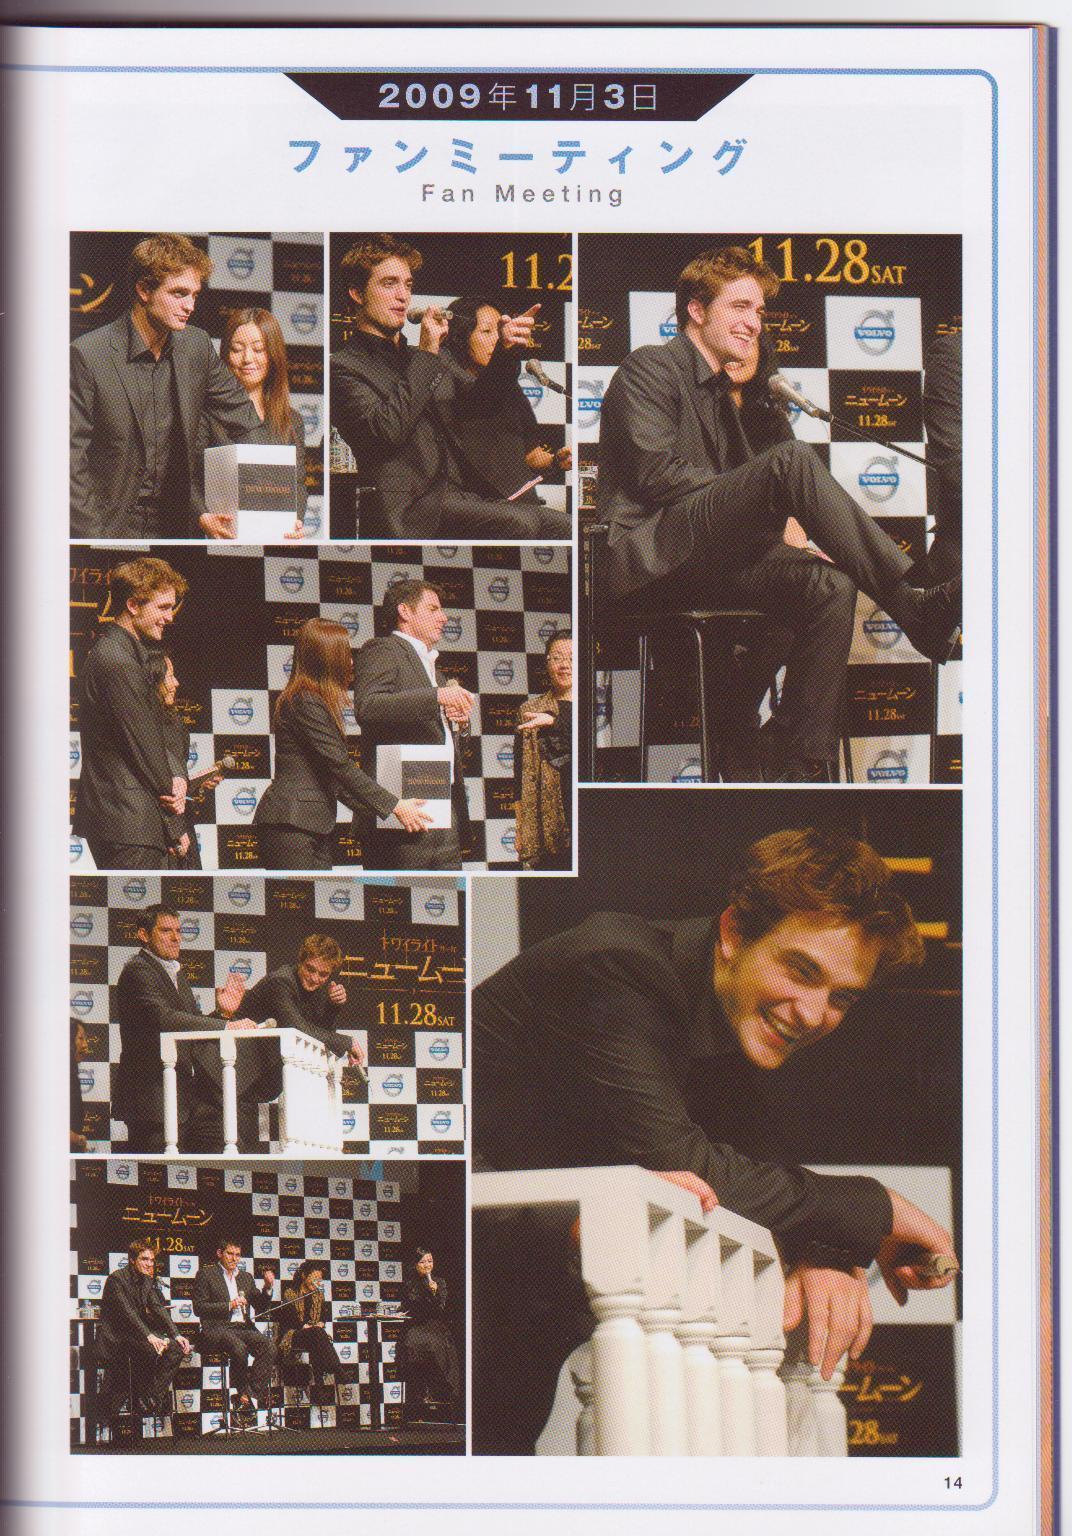 مزید New Pictures Of Robert Pattinson From Japan